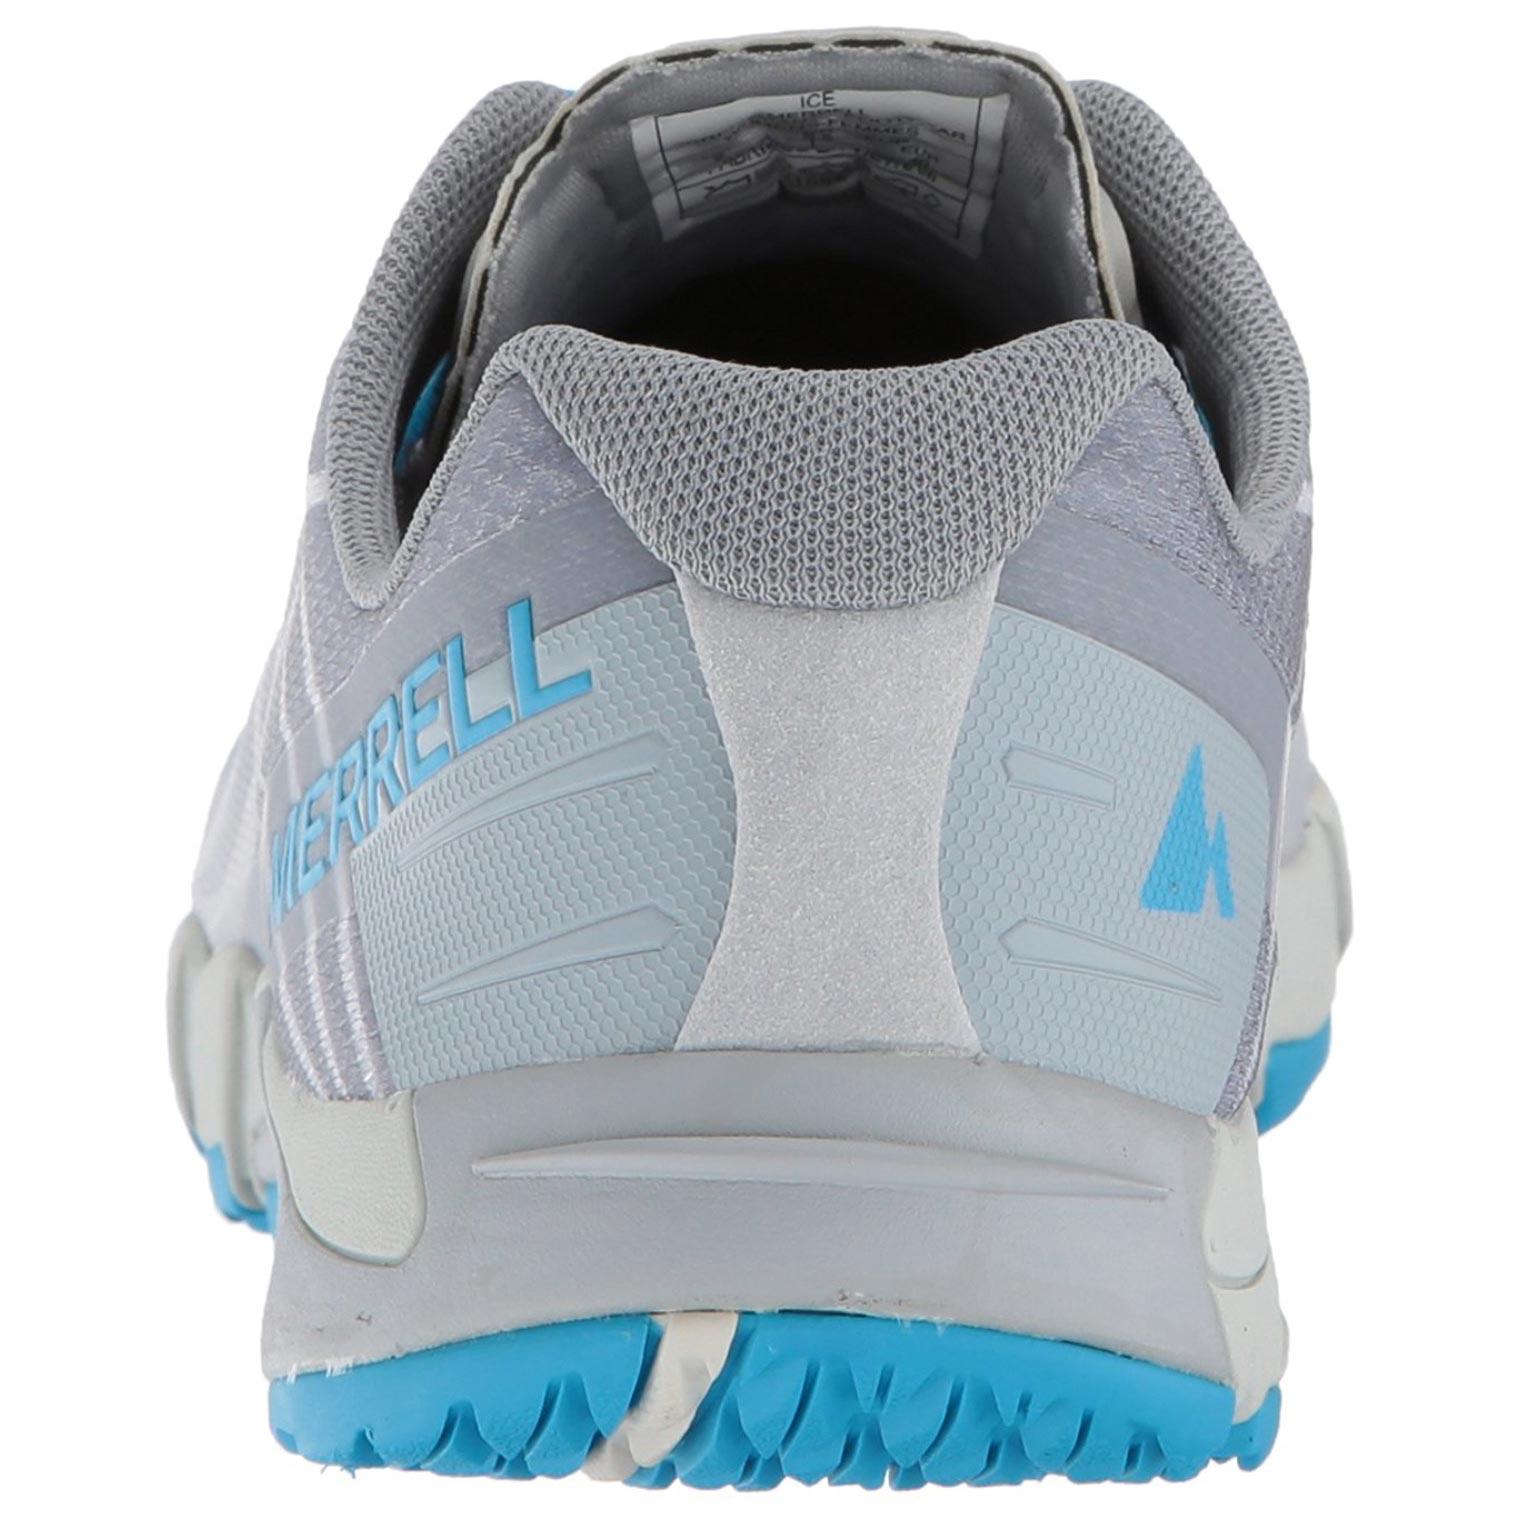 zapatos merrell hombre uruguay hombres